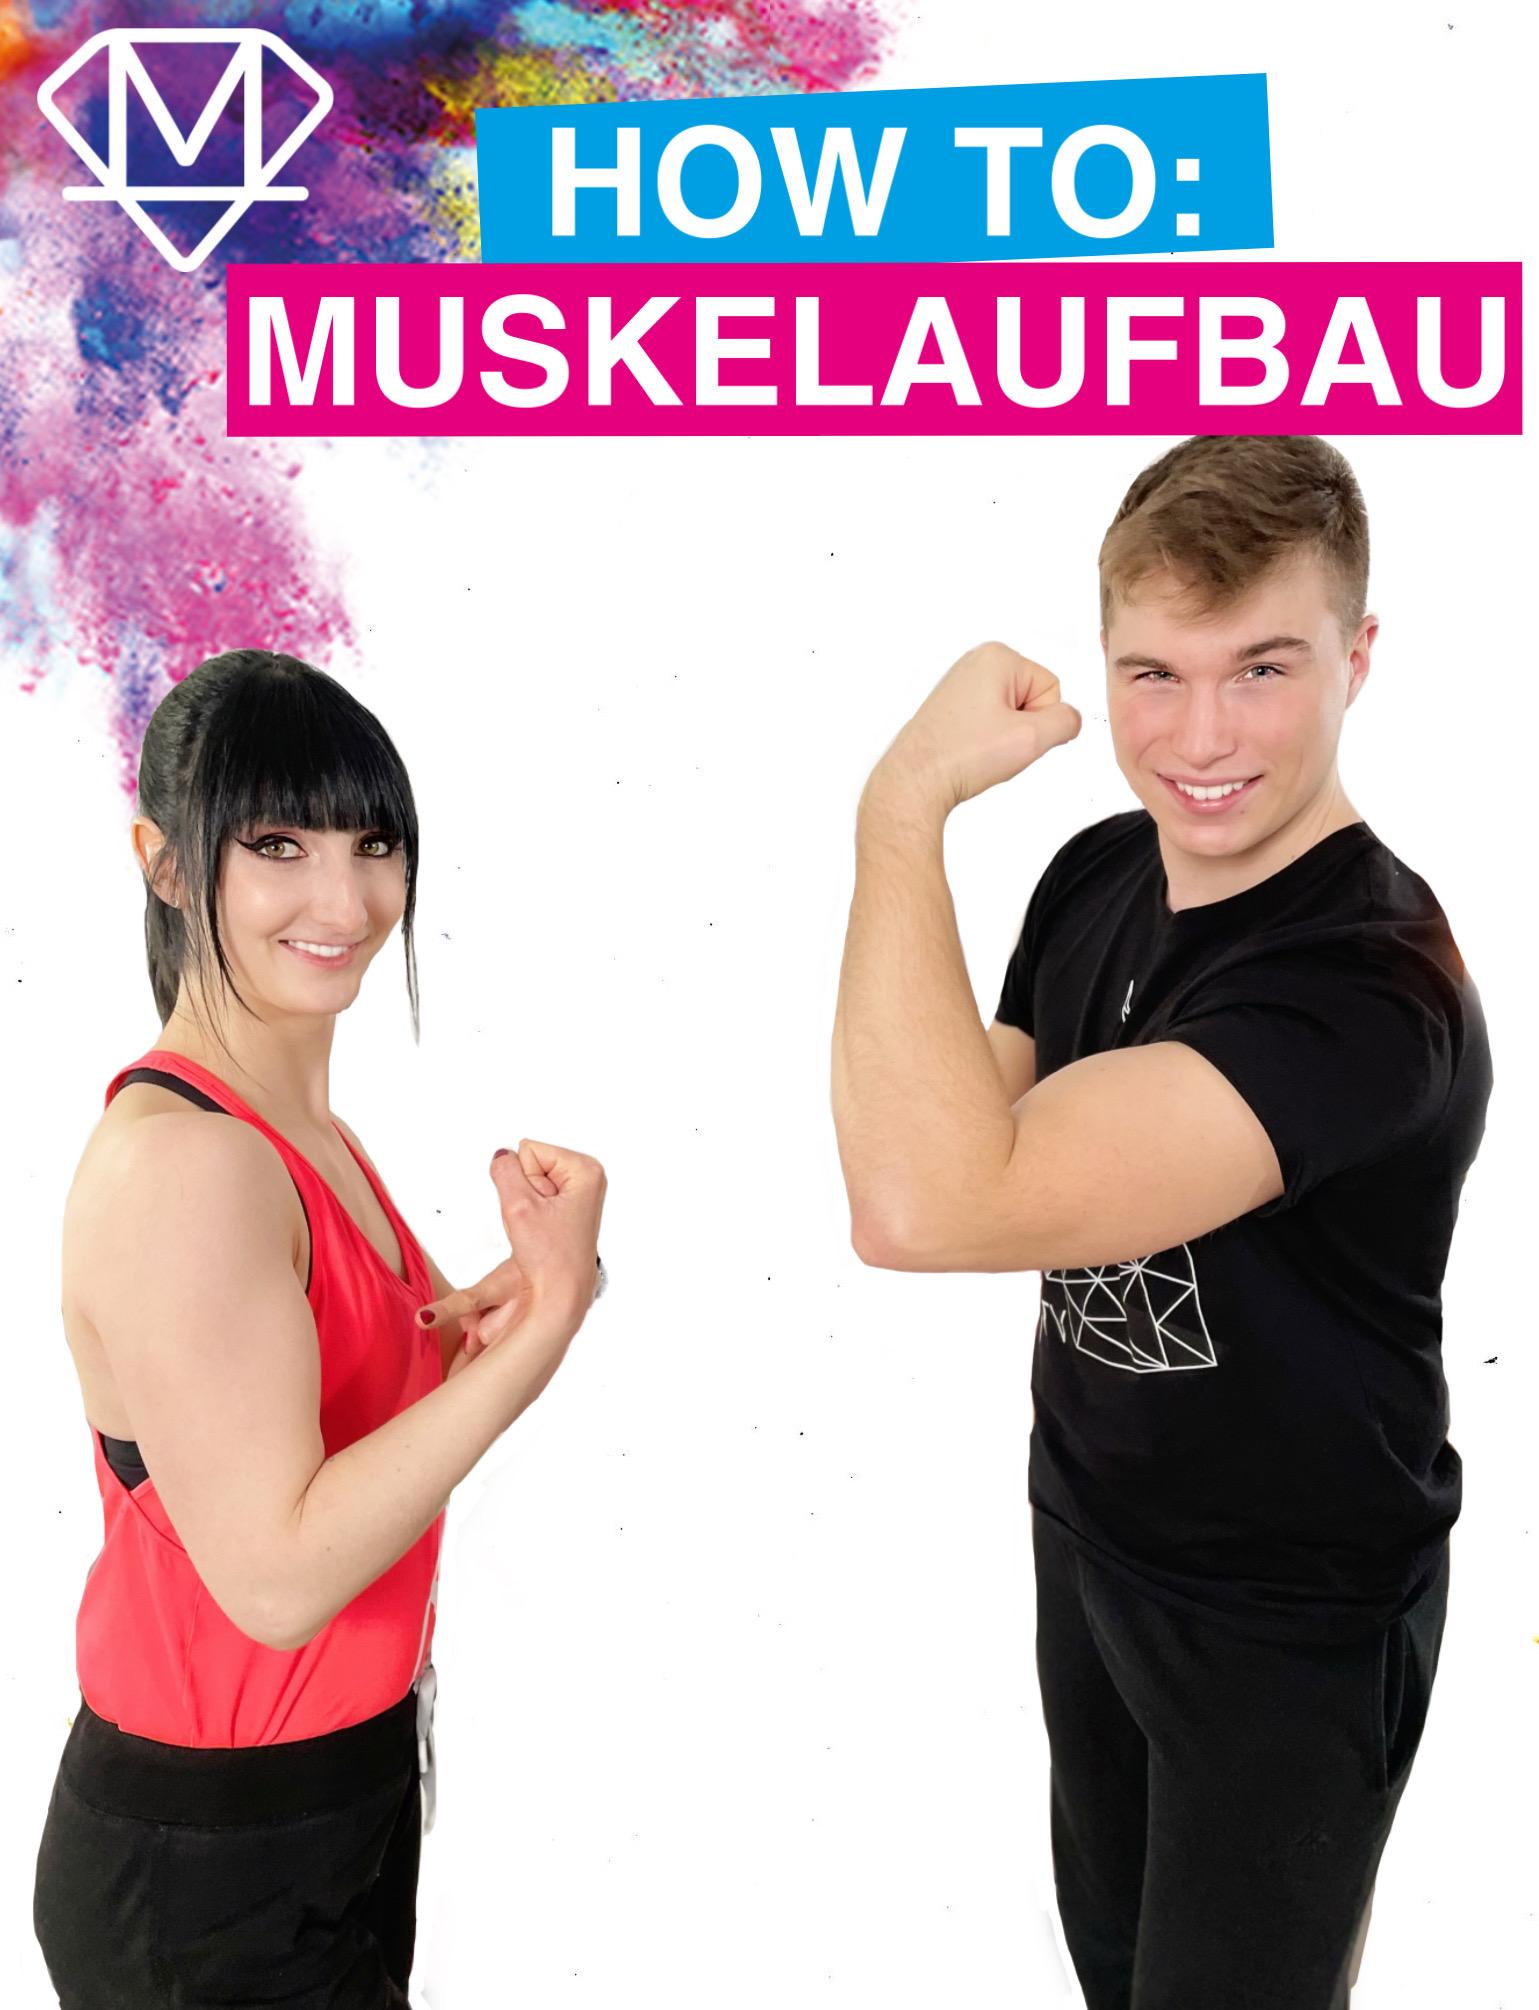 How to: Muskelaufbau